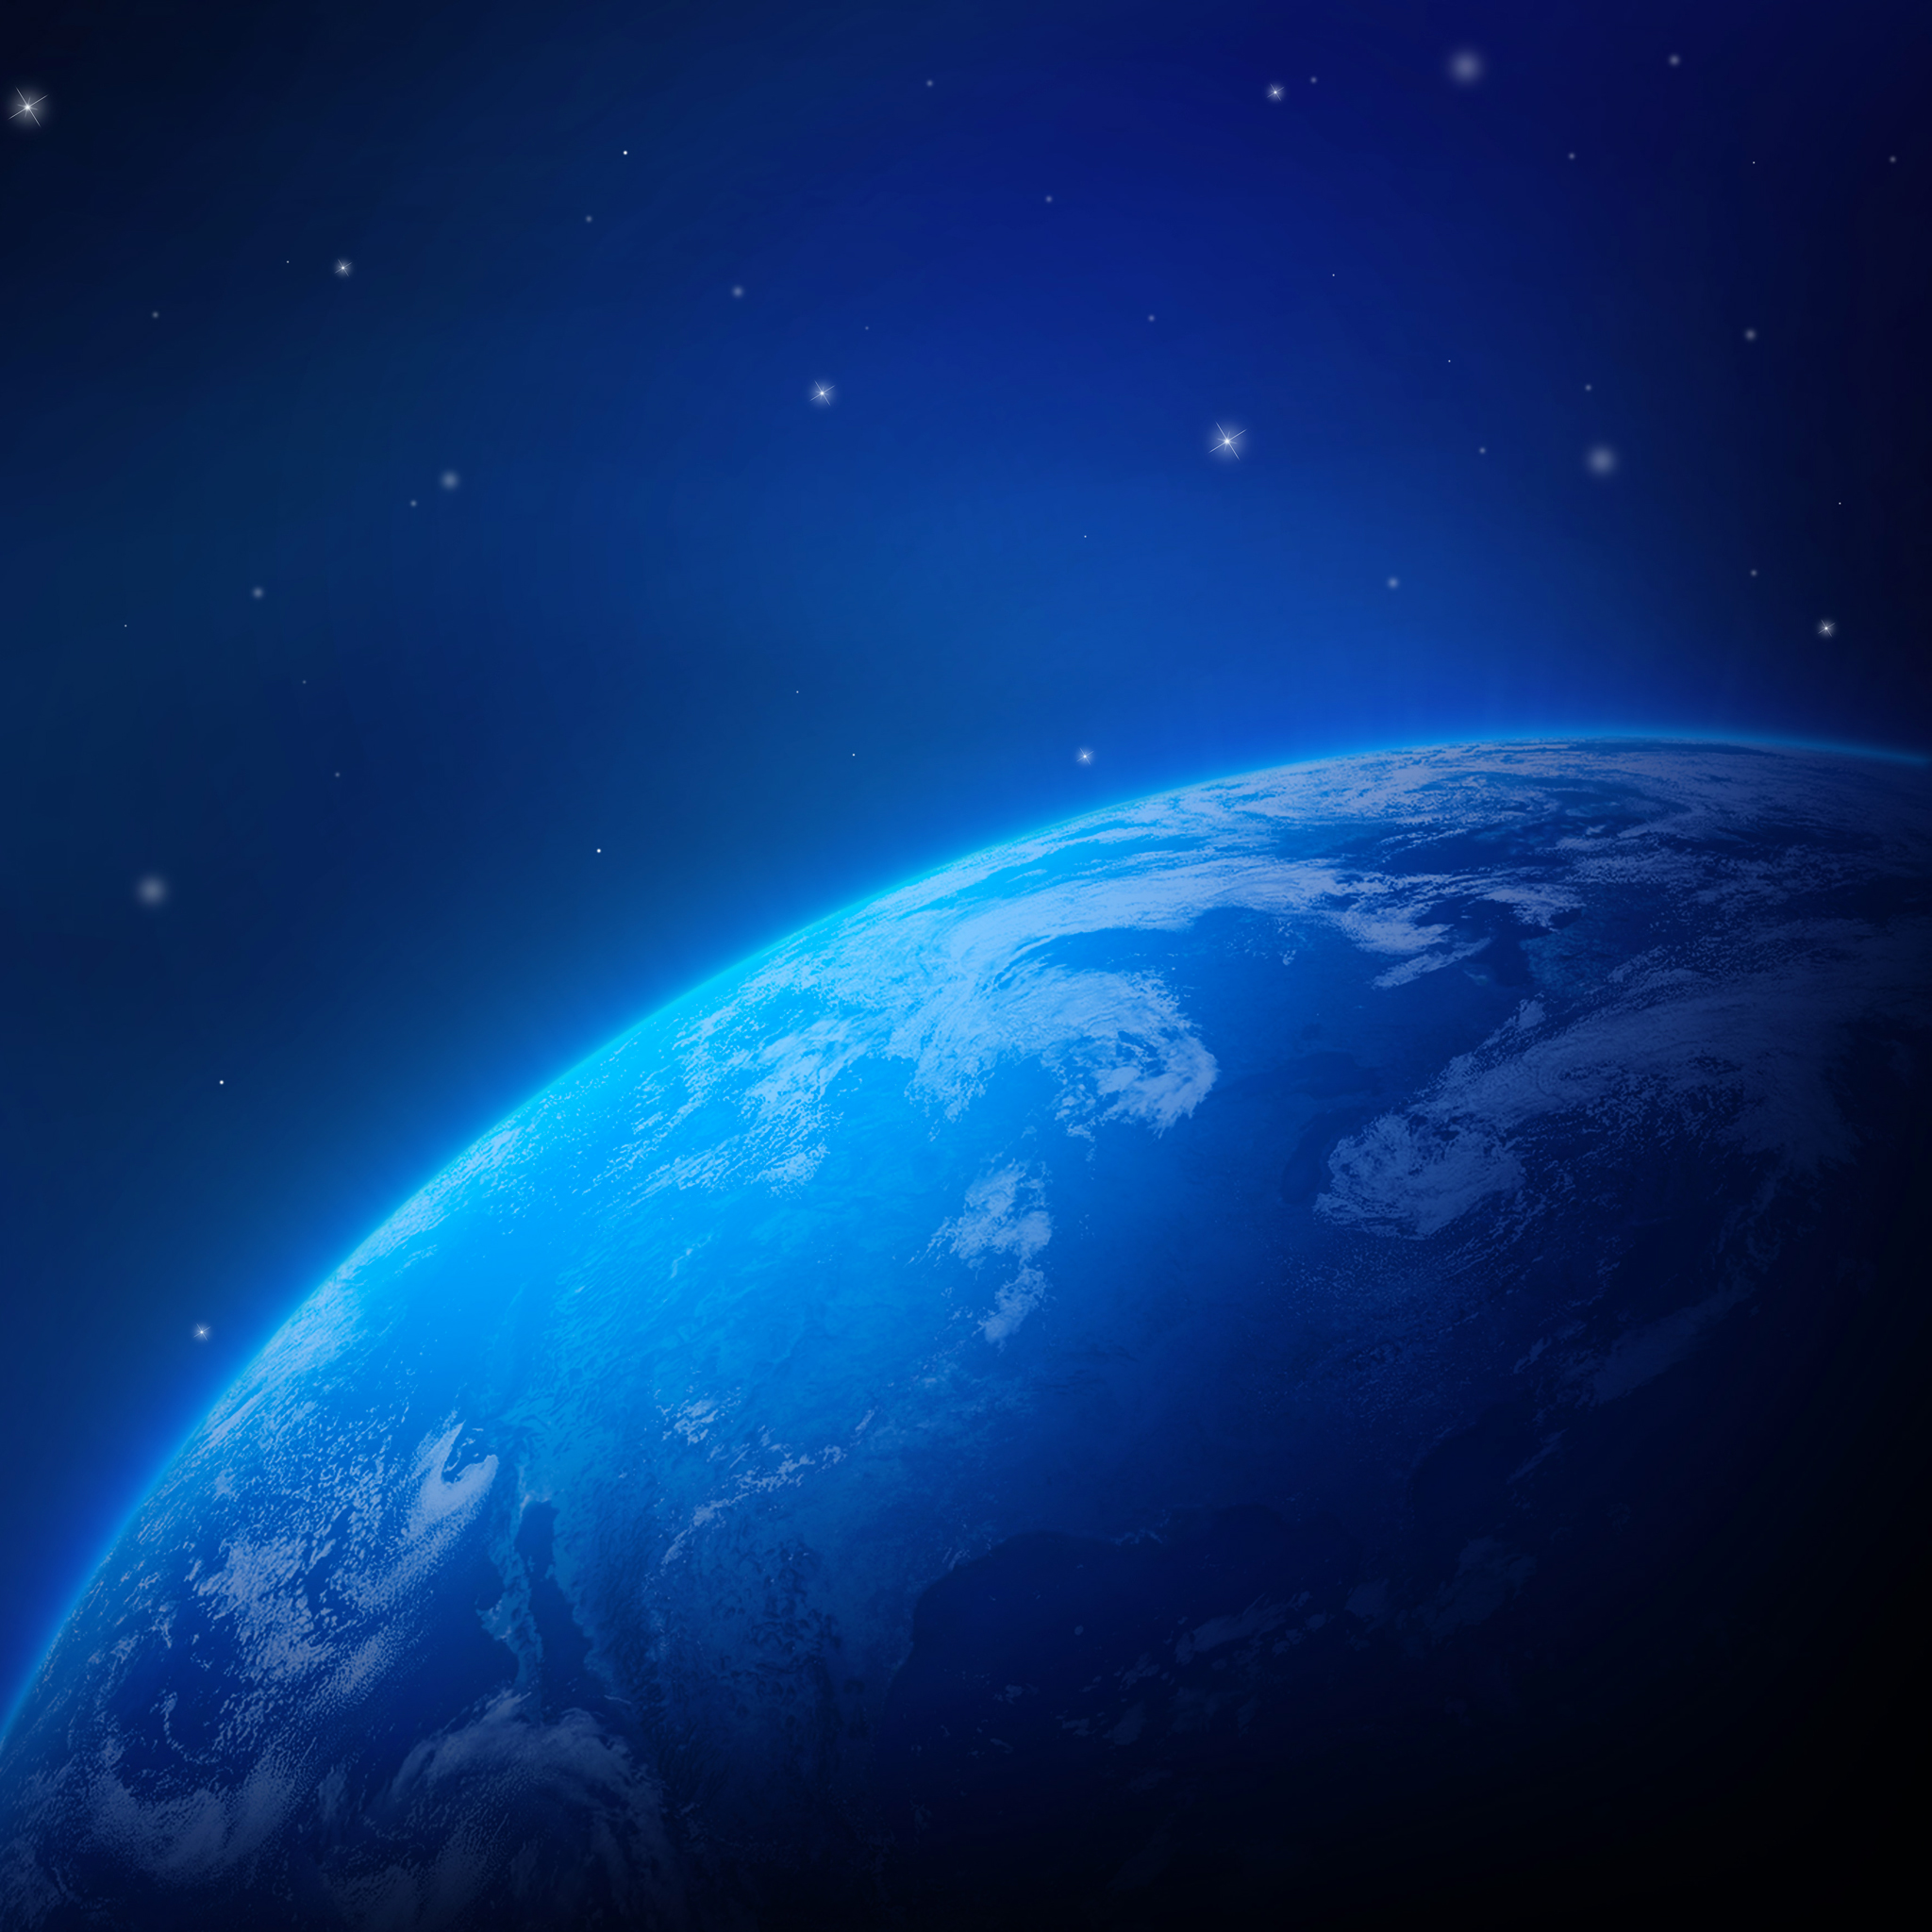 Planet Earth 3Wallpapers iPad Retina Planet Earth   iPad Retina